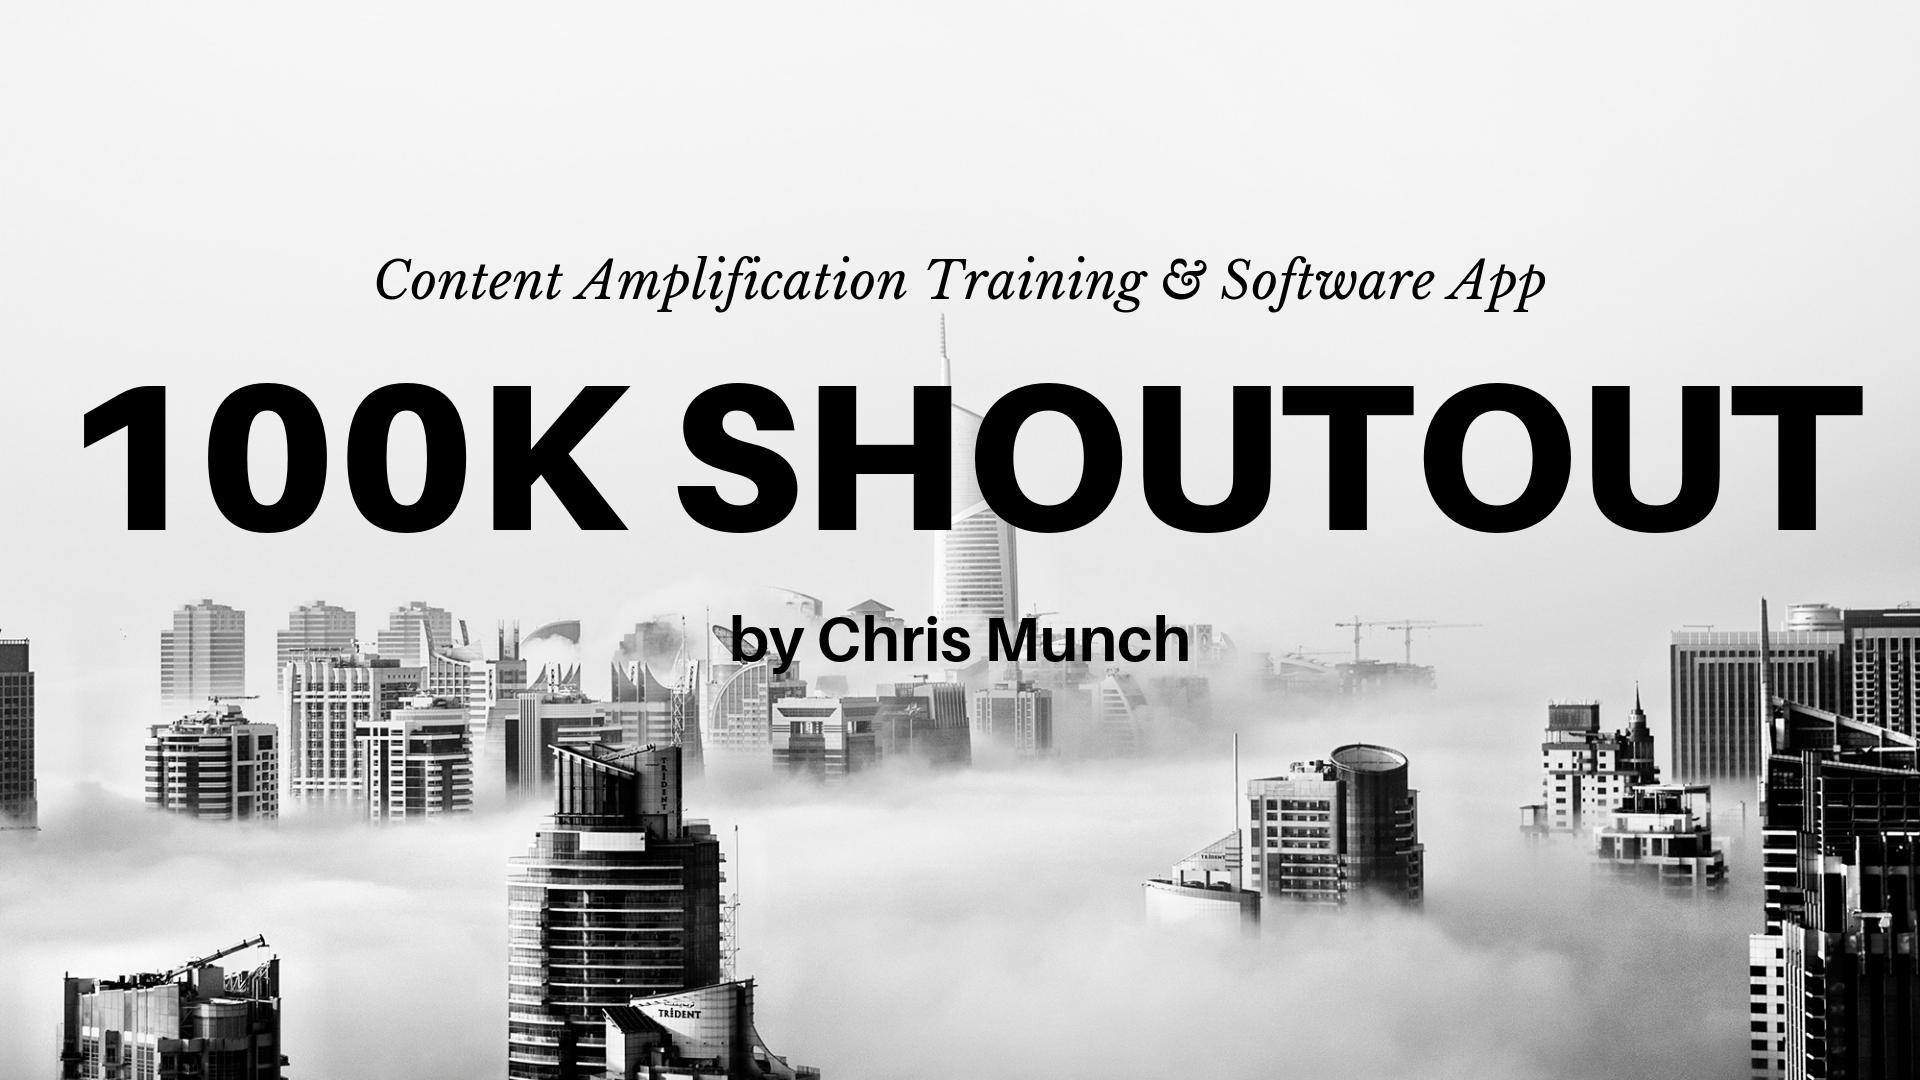 100K shoutout review training software app